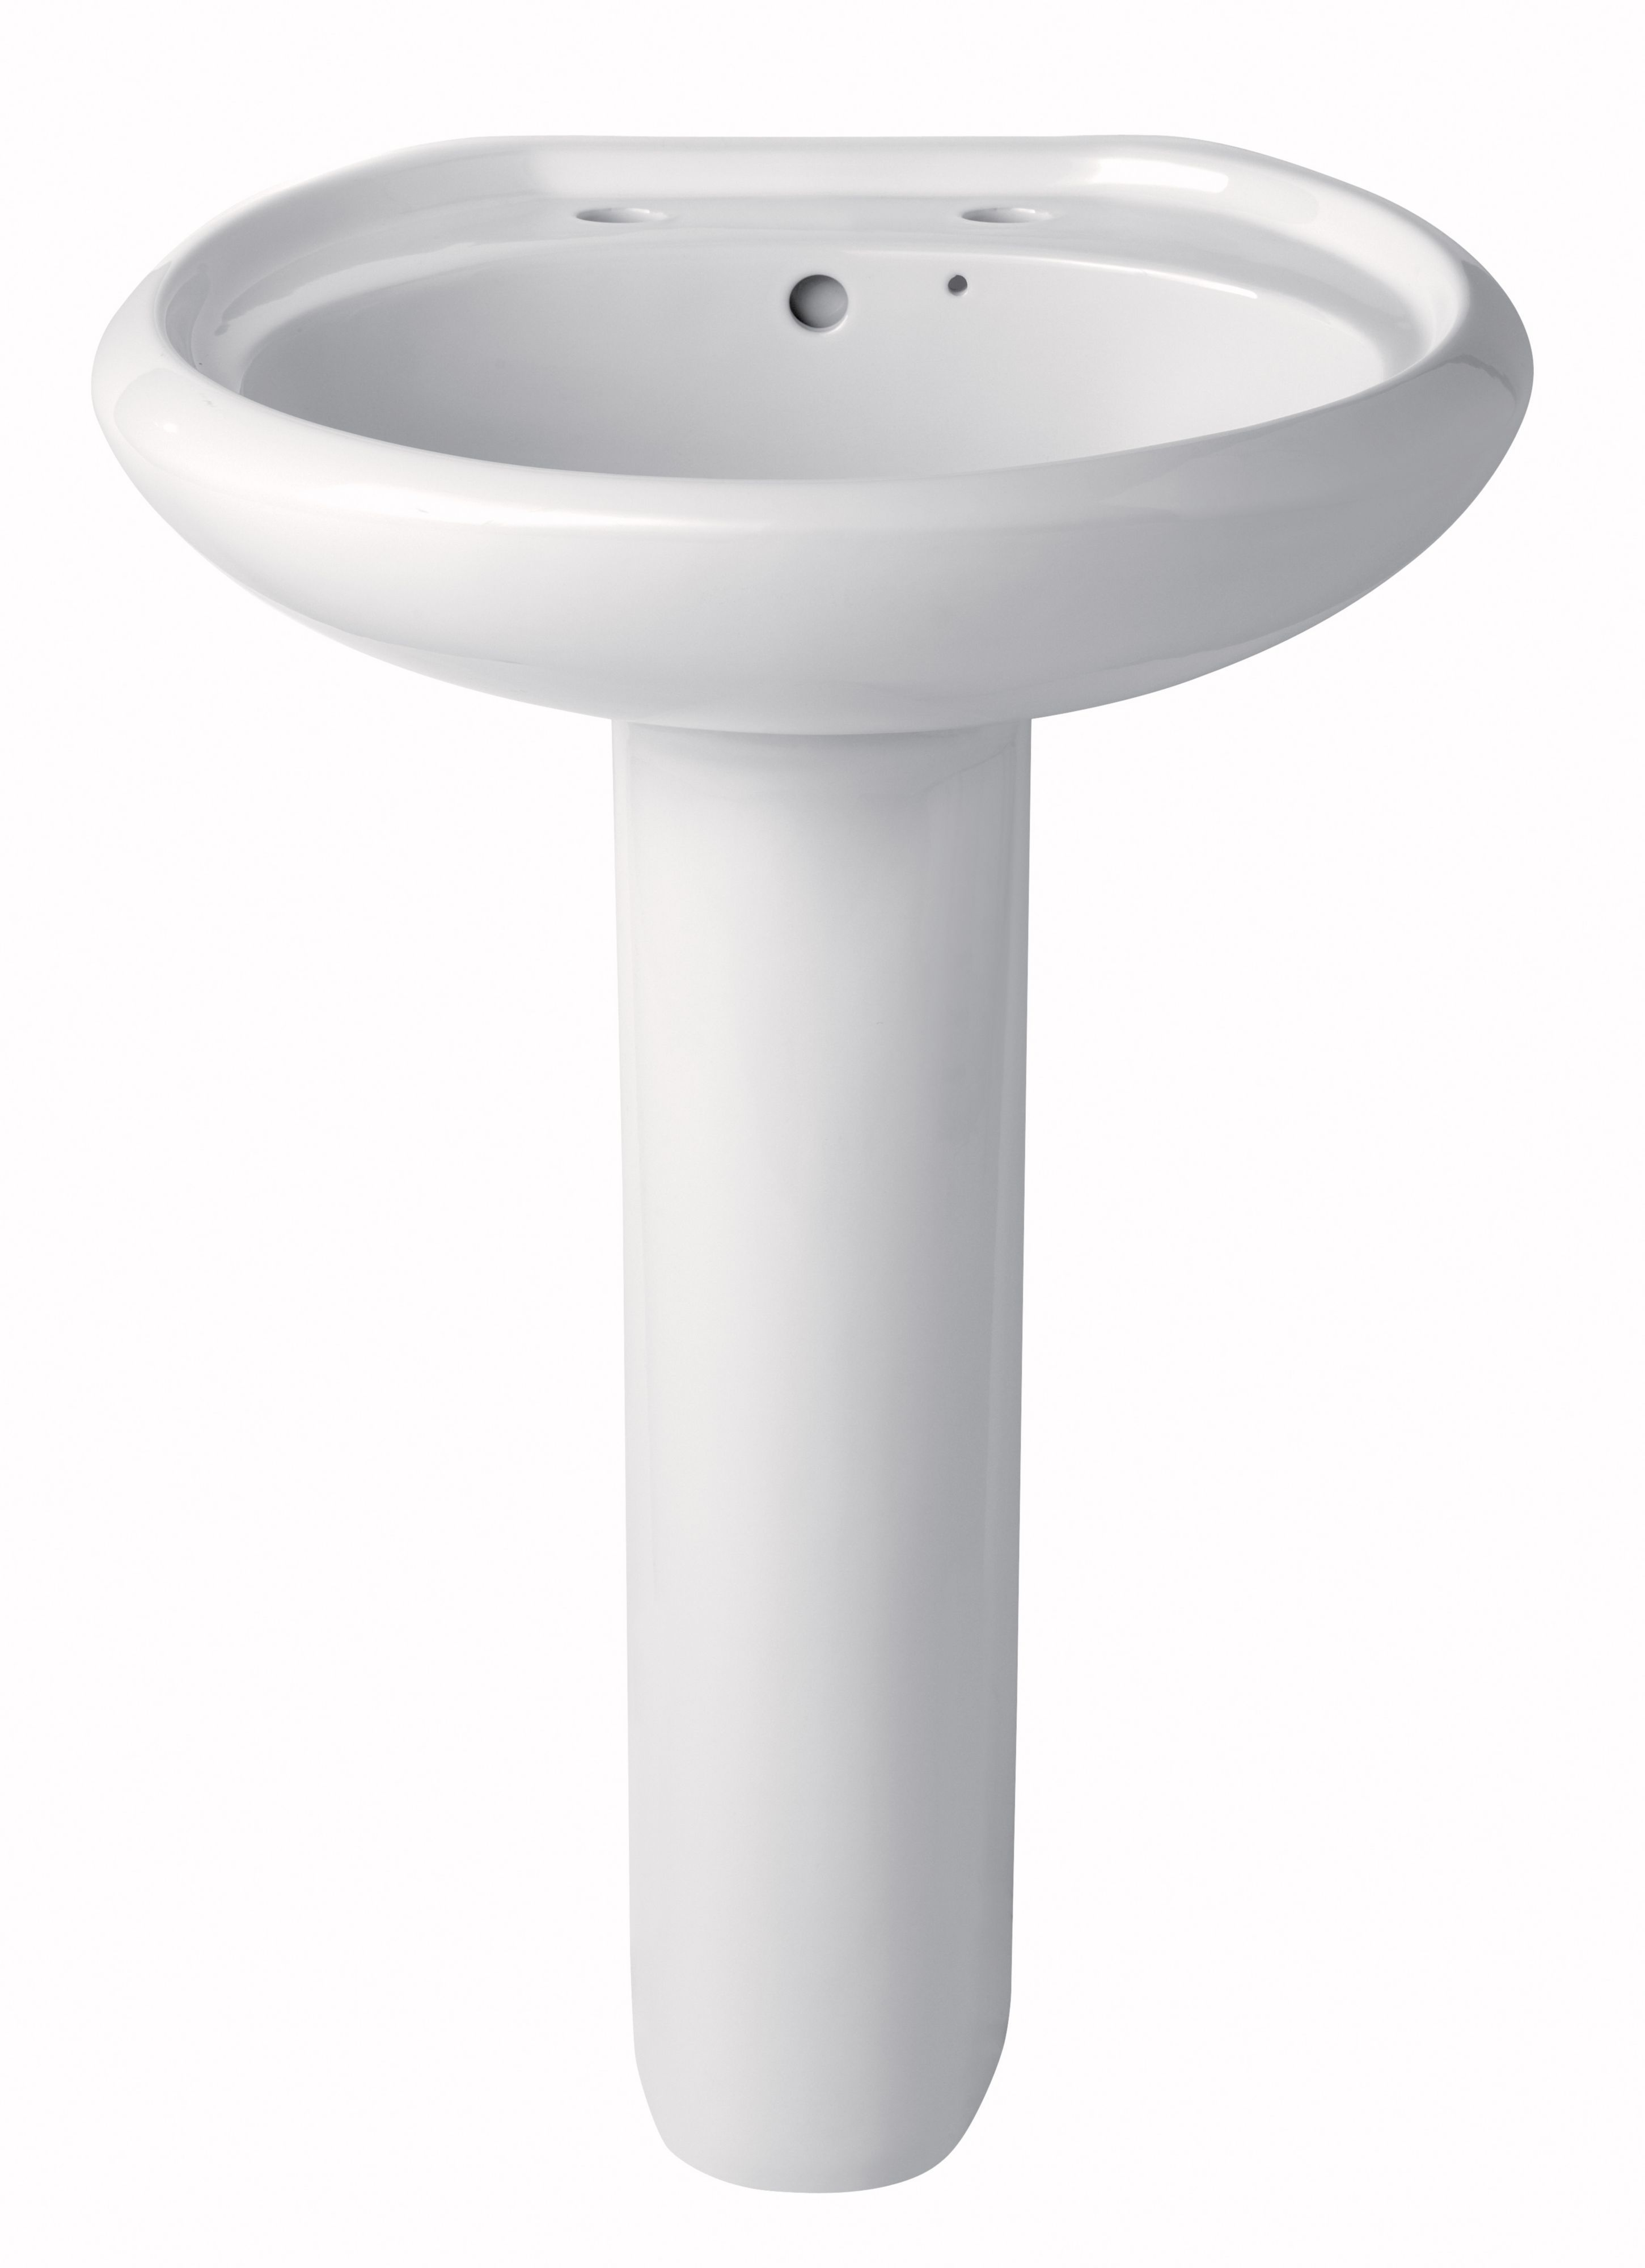 Bathroom Sinks B&Q Ireland plumbsure newbury full pedestal basin | departments | diy at b&q